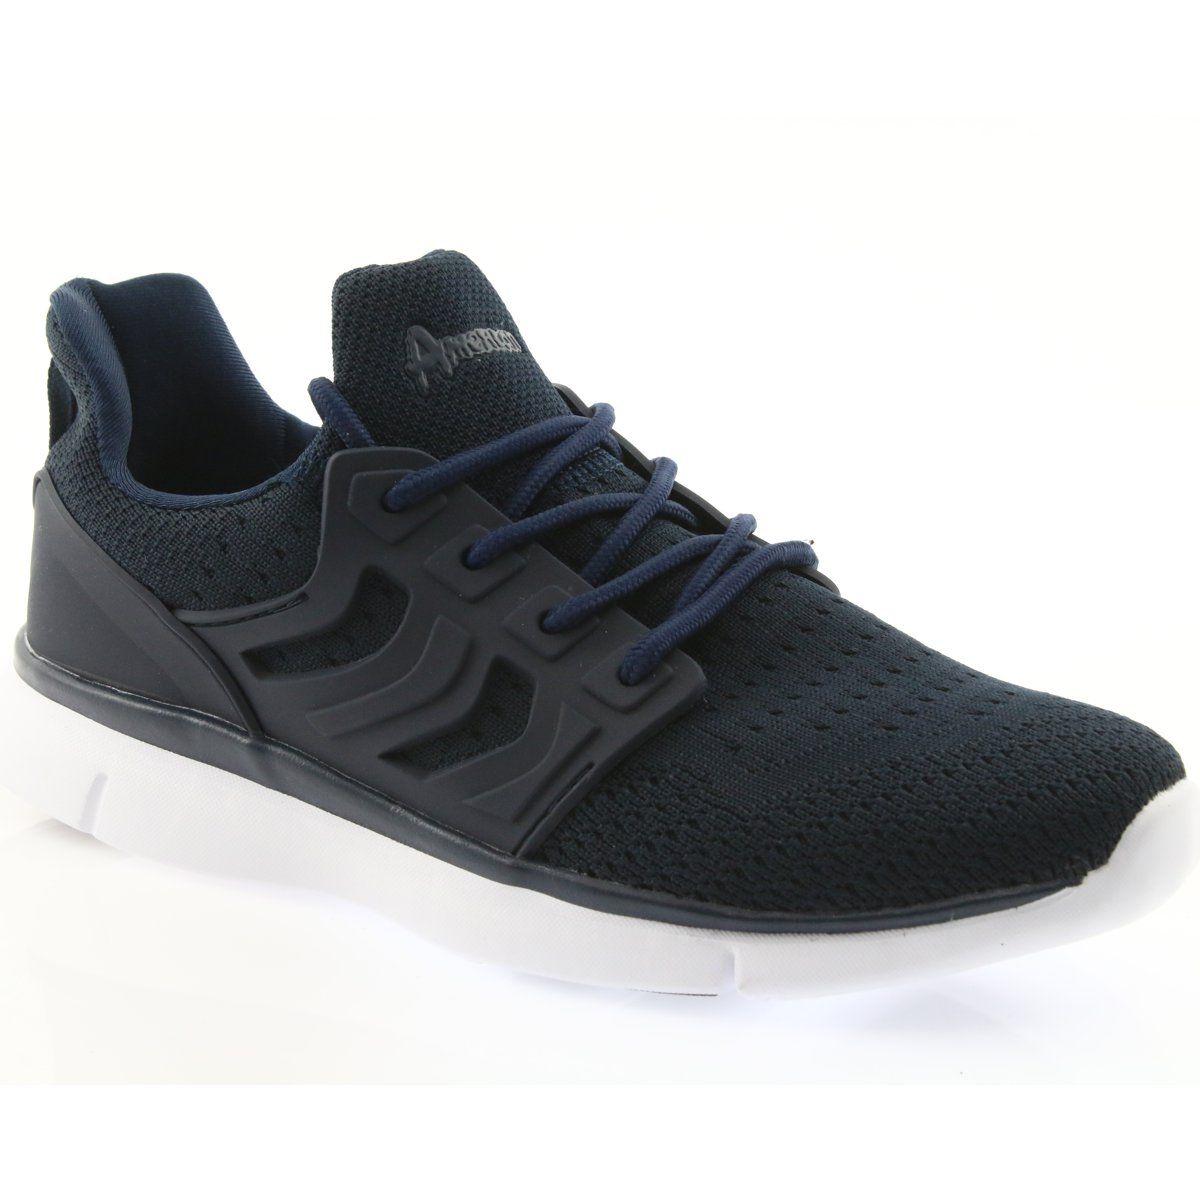 American Club Buty Sportowe American Fh07 Granatowe Sport Shoes Shoes All Black Sneakers